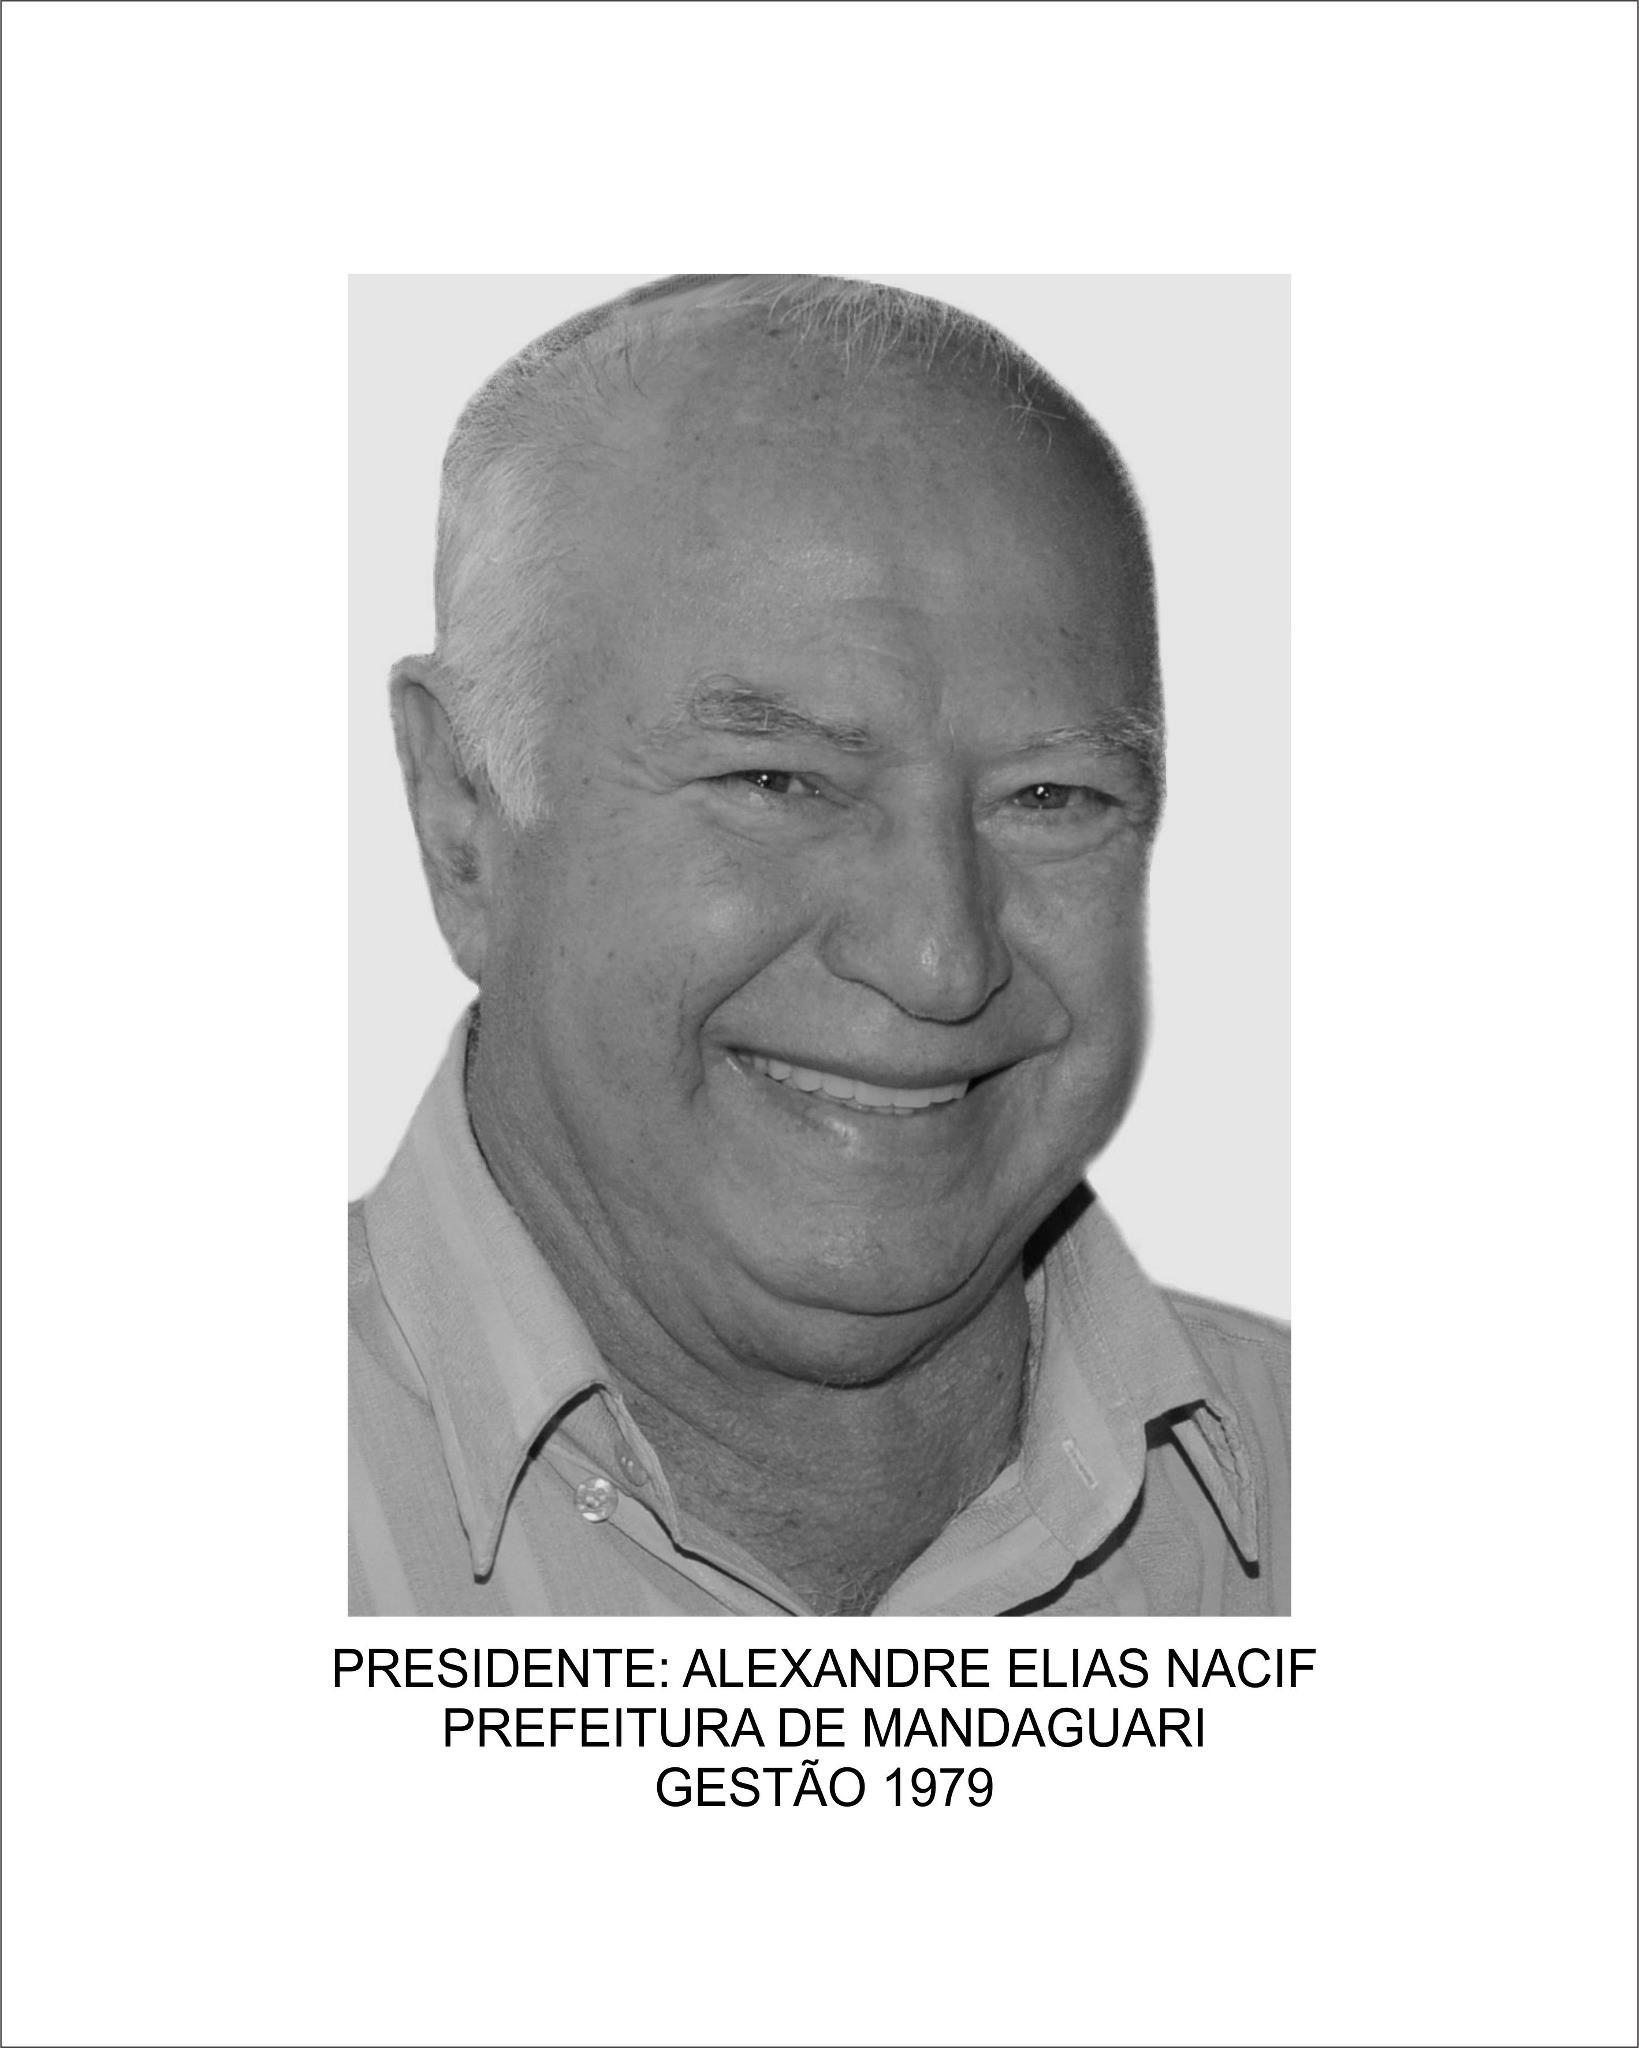 Alexandre Elias Nacif